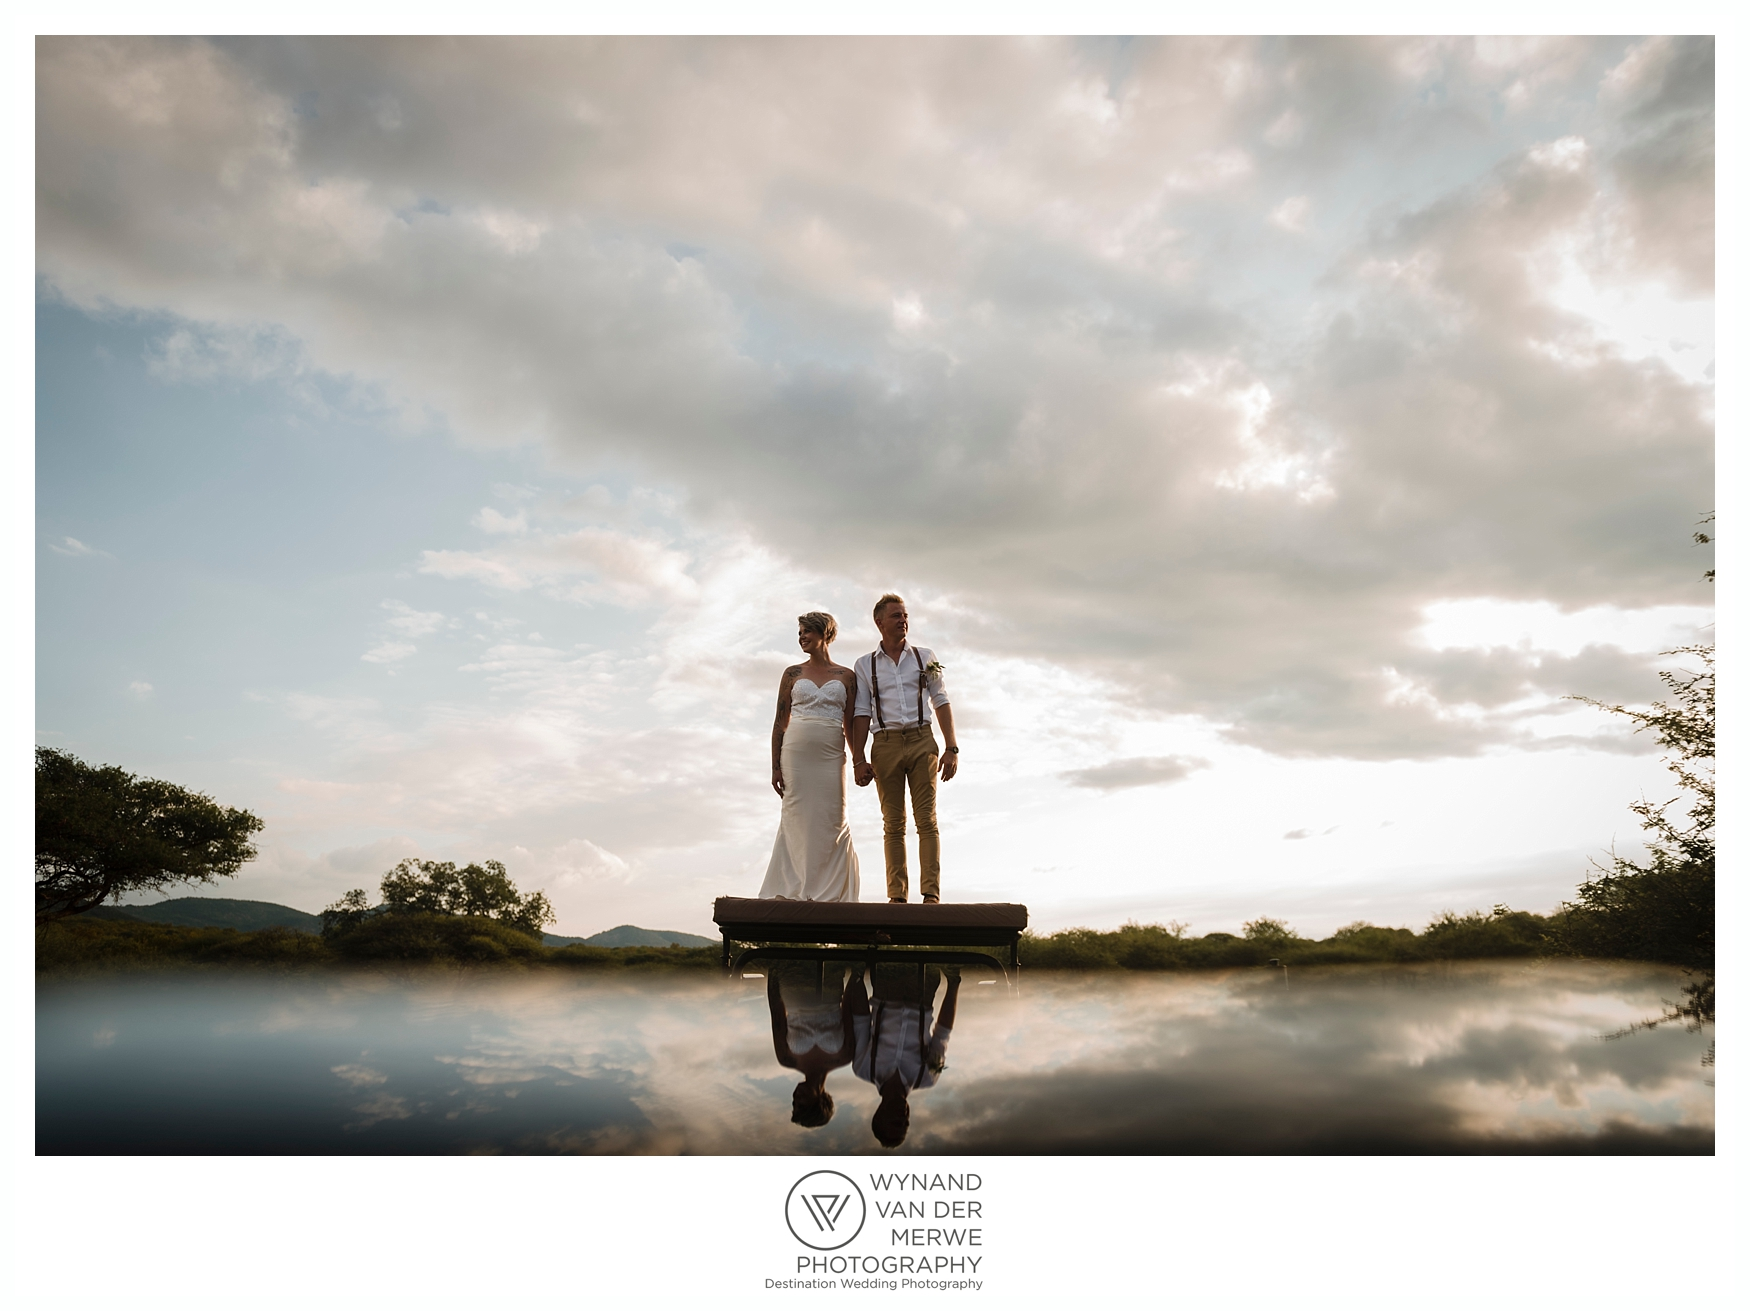 WynandvanderMerwe_weddingphotography_bushveldwedding_northam_bushveld_limpopowedding_limpopo_southafrica-220.jpg